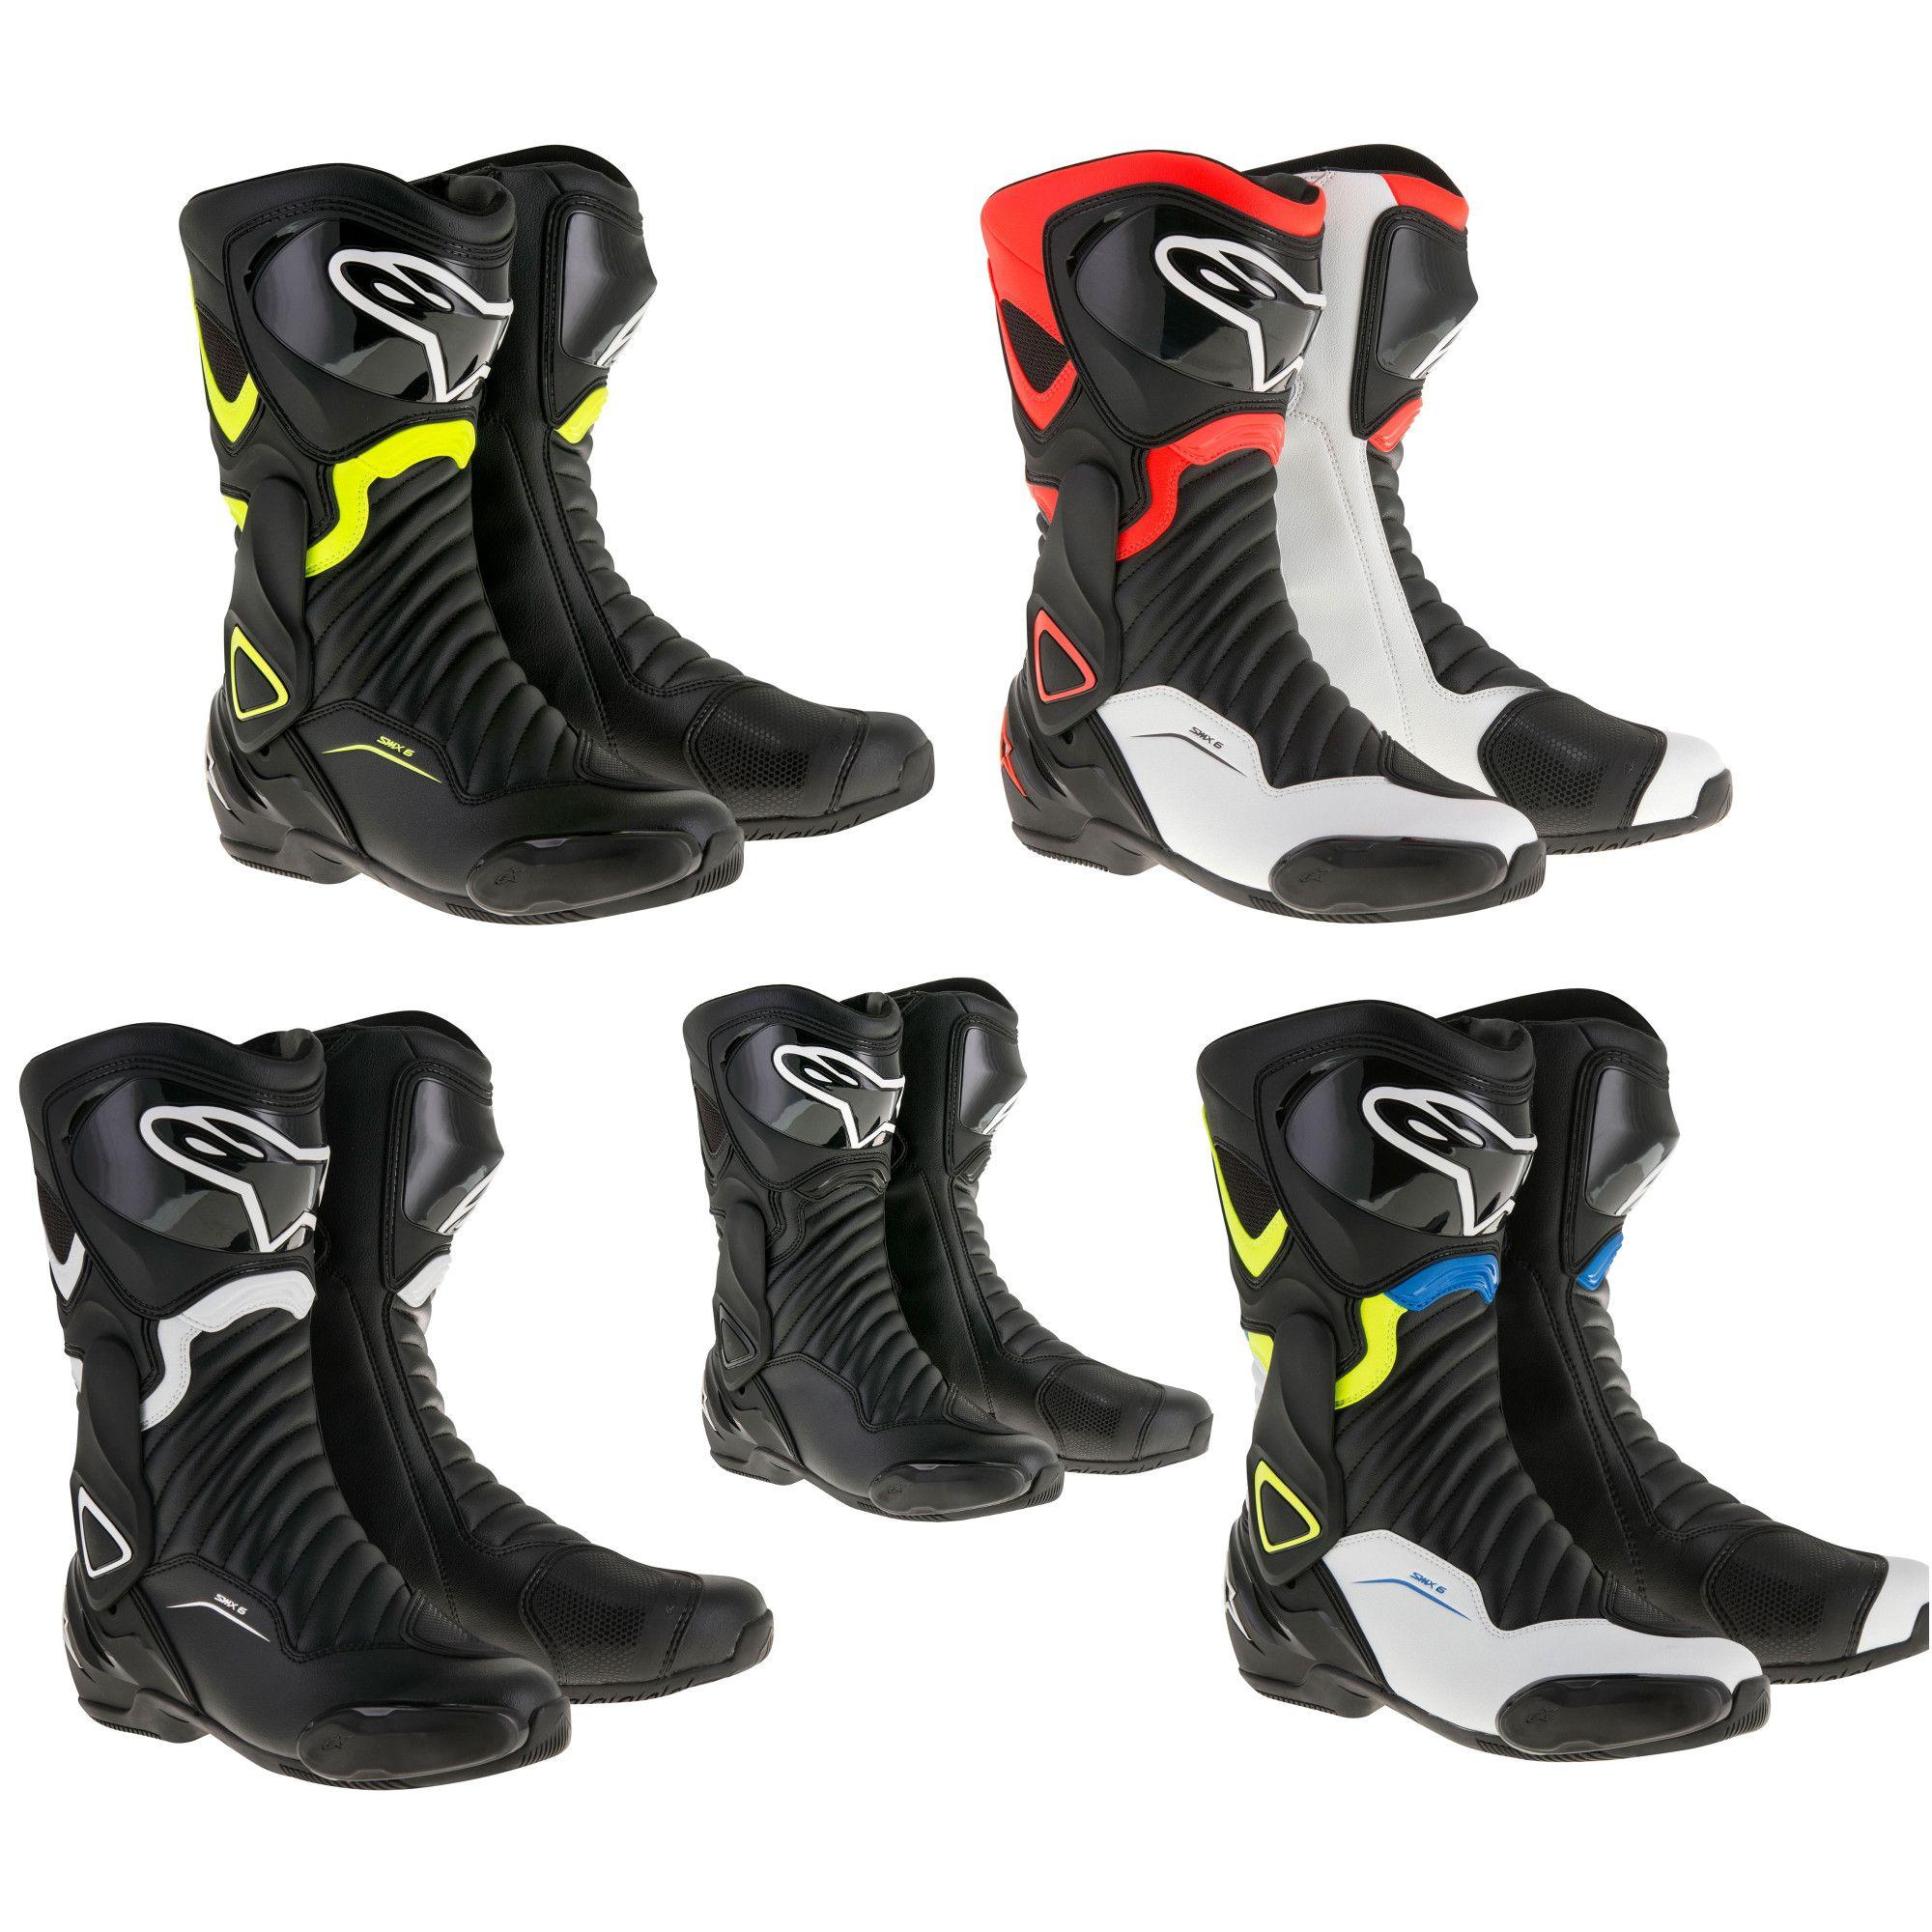 Details about Alpinestars SMX 6 V2 Road MotorcycleBikeMotorbikeBiking Riding Boots